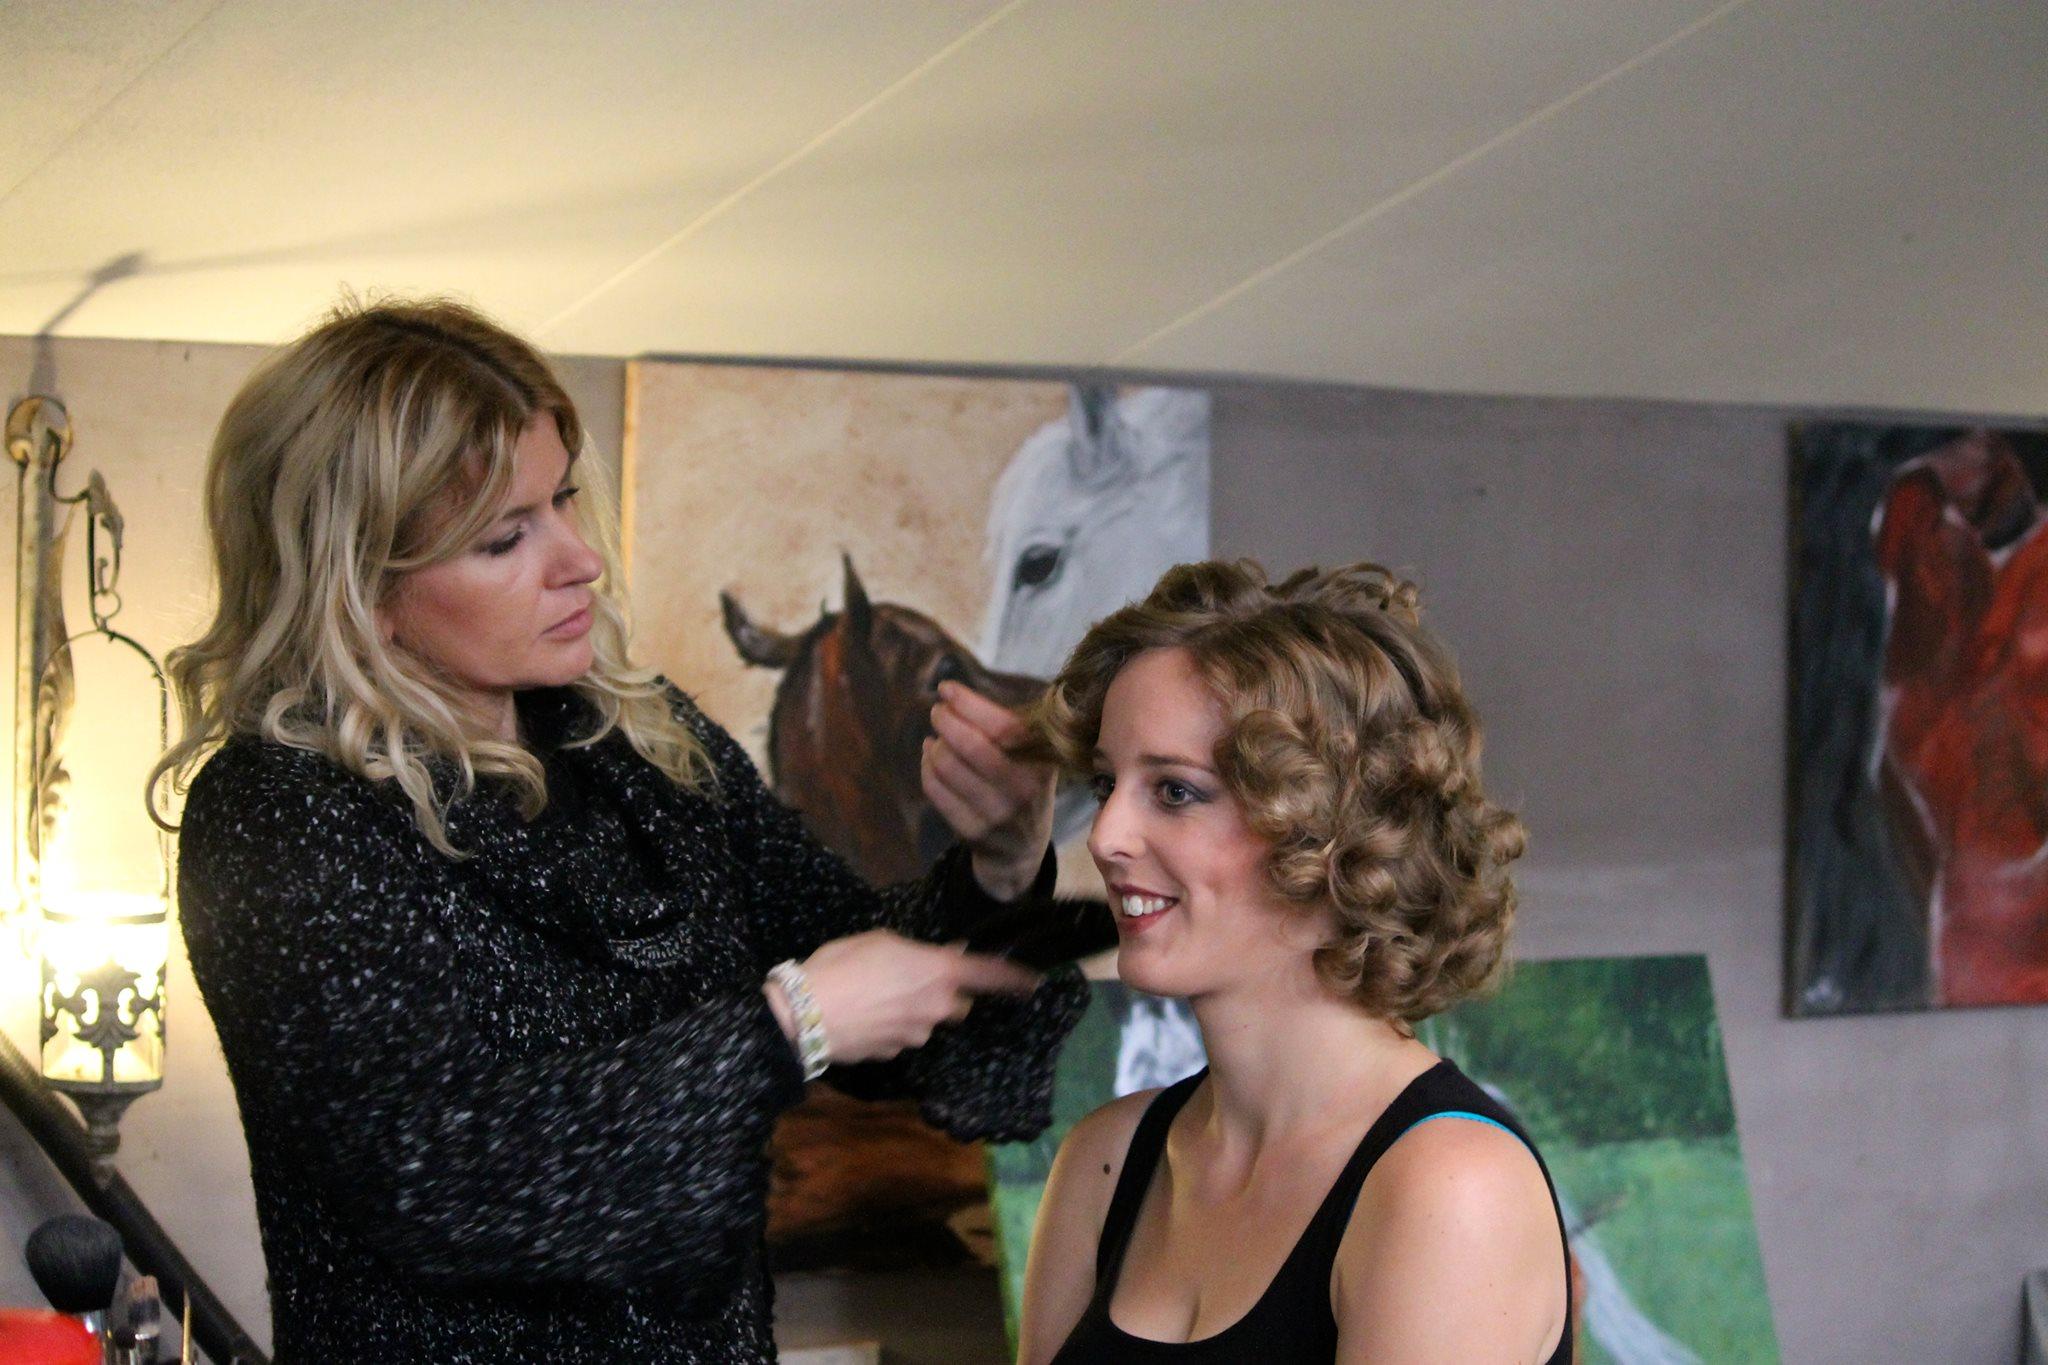 Paardenshoot in Binnenbak - Blog - Carine Belzon | Fotograaf